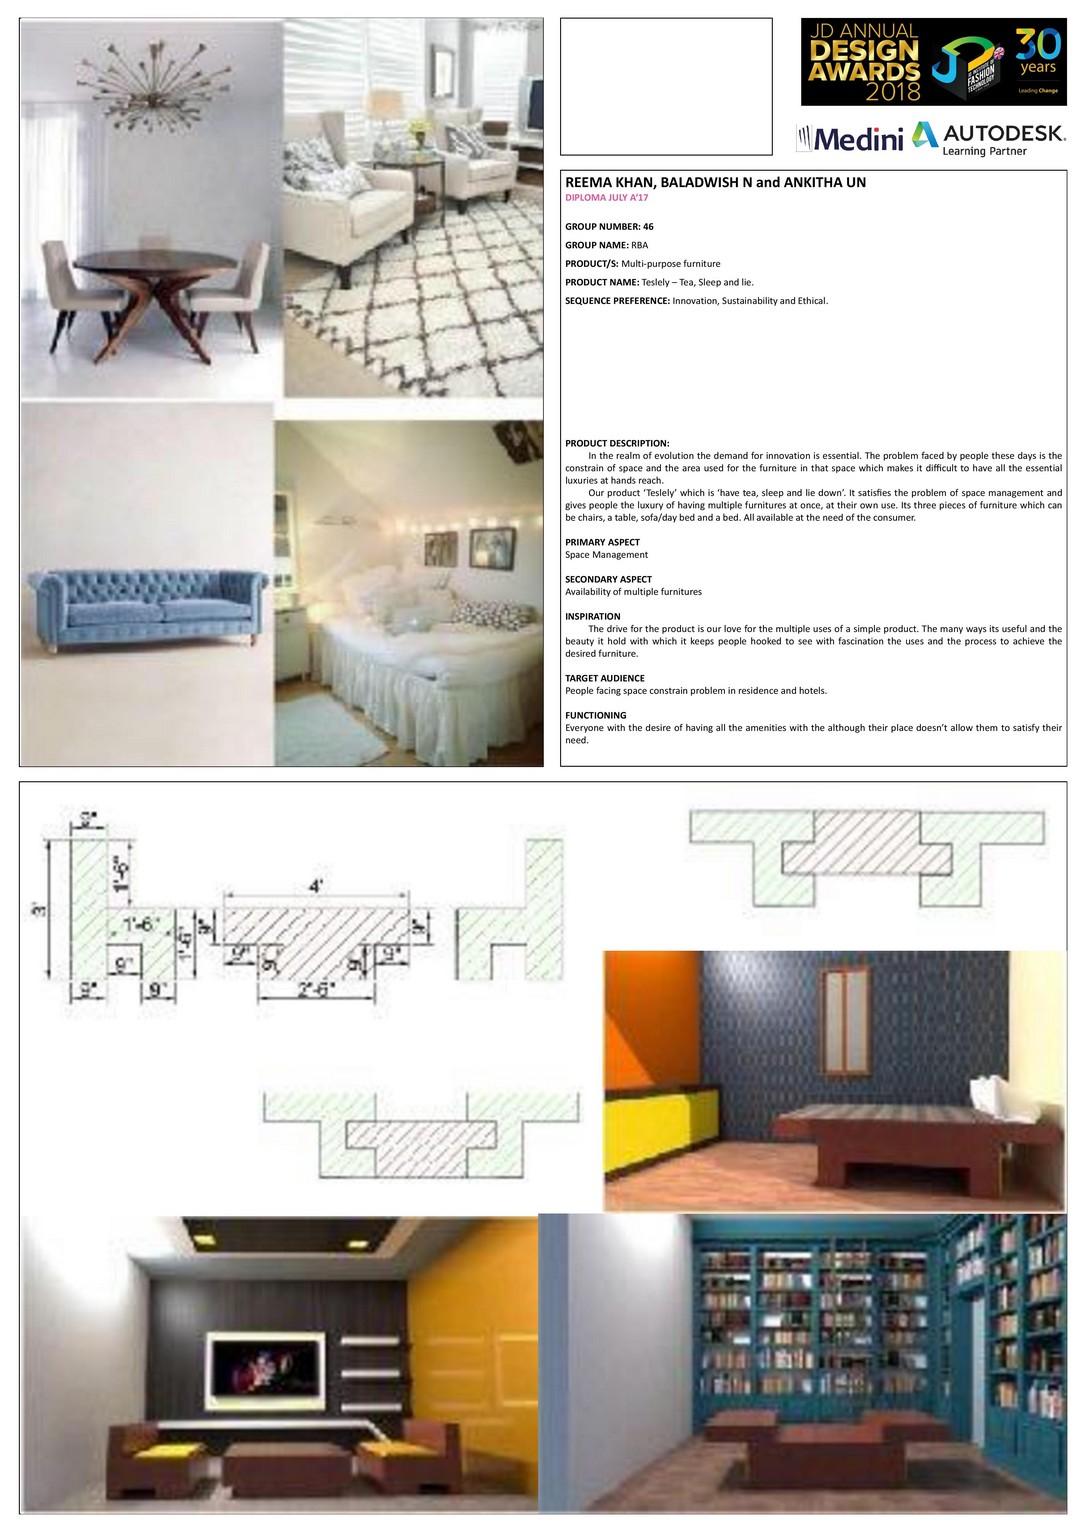 Tesleley – Change – JD Annual Design Awards 2018   Designer: Reema Khan, Baladwish.N, Ankitha.U.N   Photography : Jerin Nath (@jerin_nath) tesleley Tesleley – Change – JD Annual Design Awards 2018 tesleley1